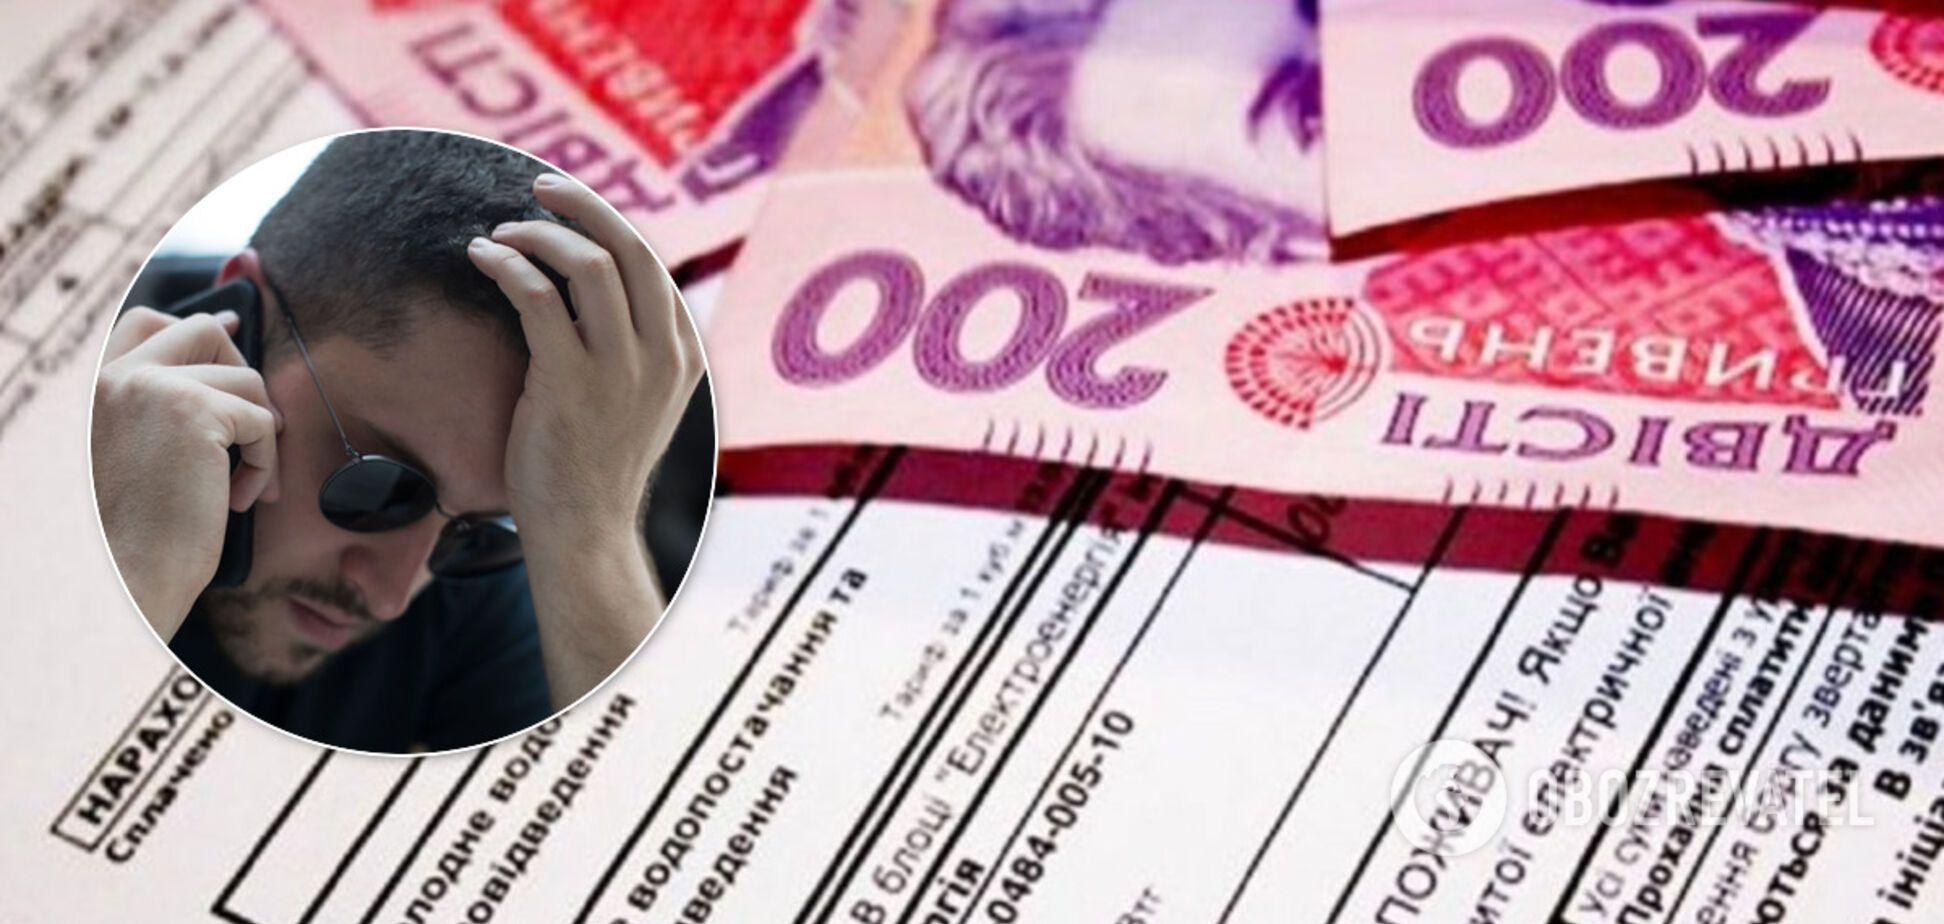 'Київводоканал' найме колекторів: адвокат дав пораду боржникам